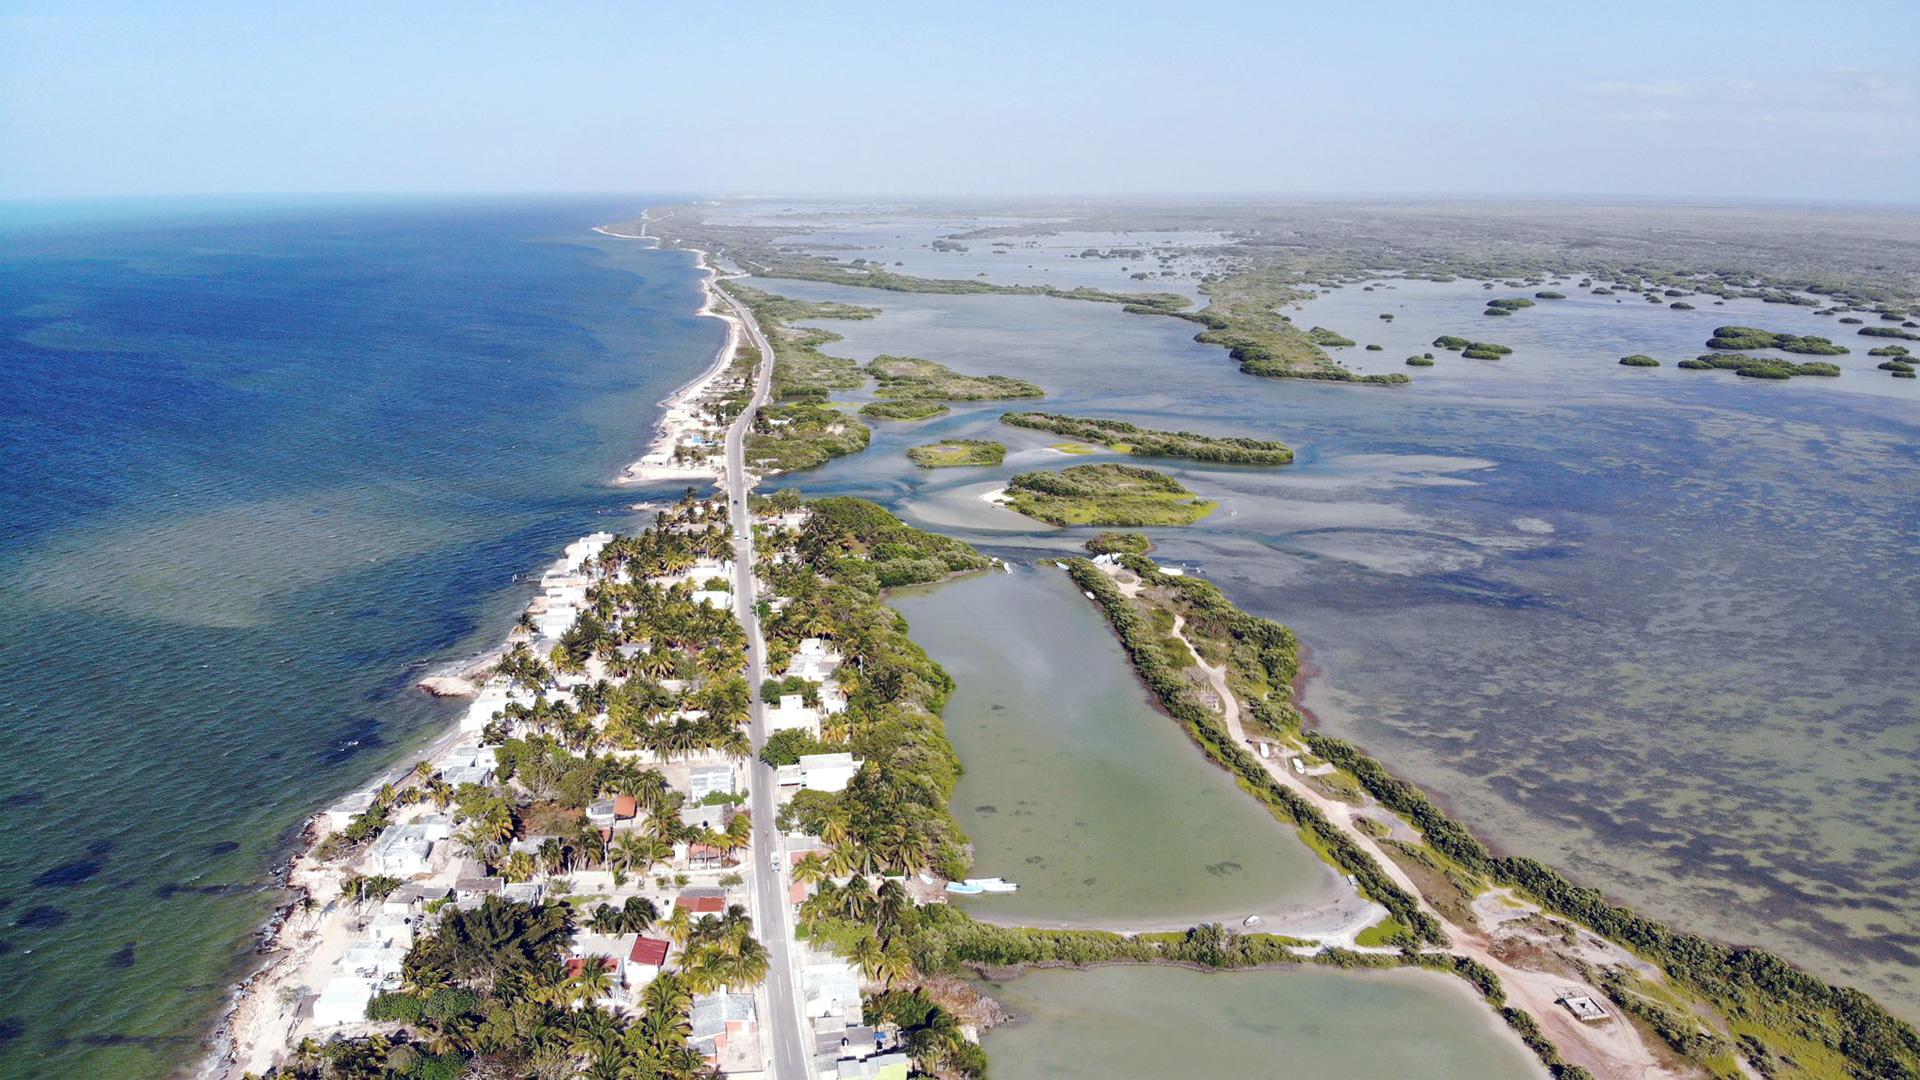 Chabihau, playa secreta de Yuacatán